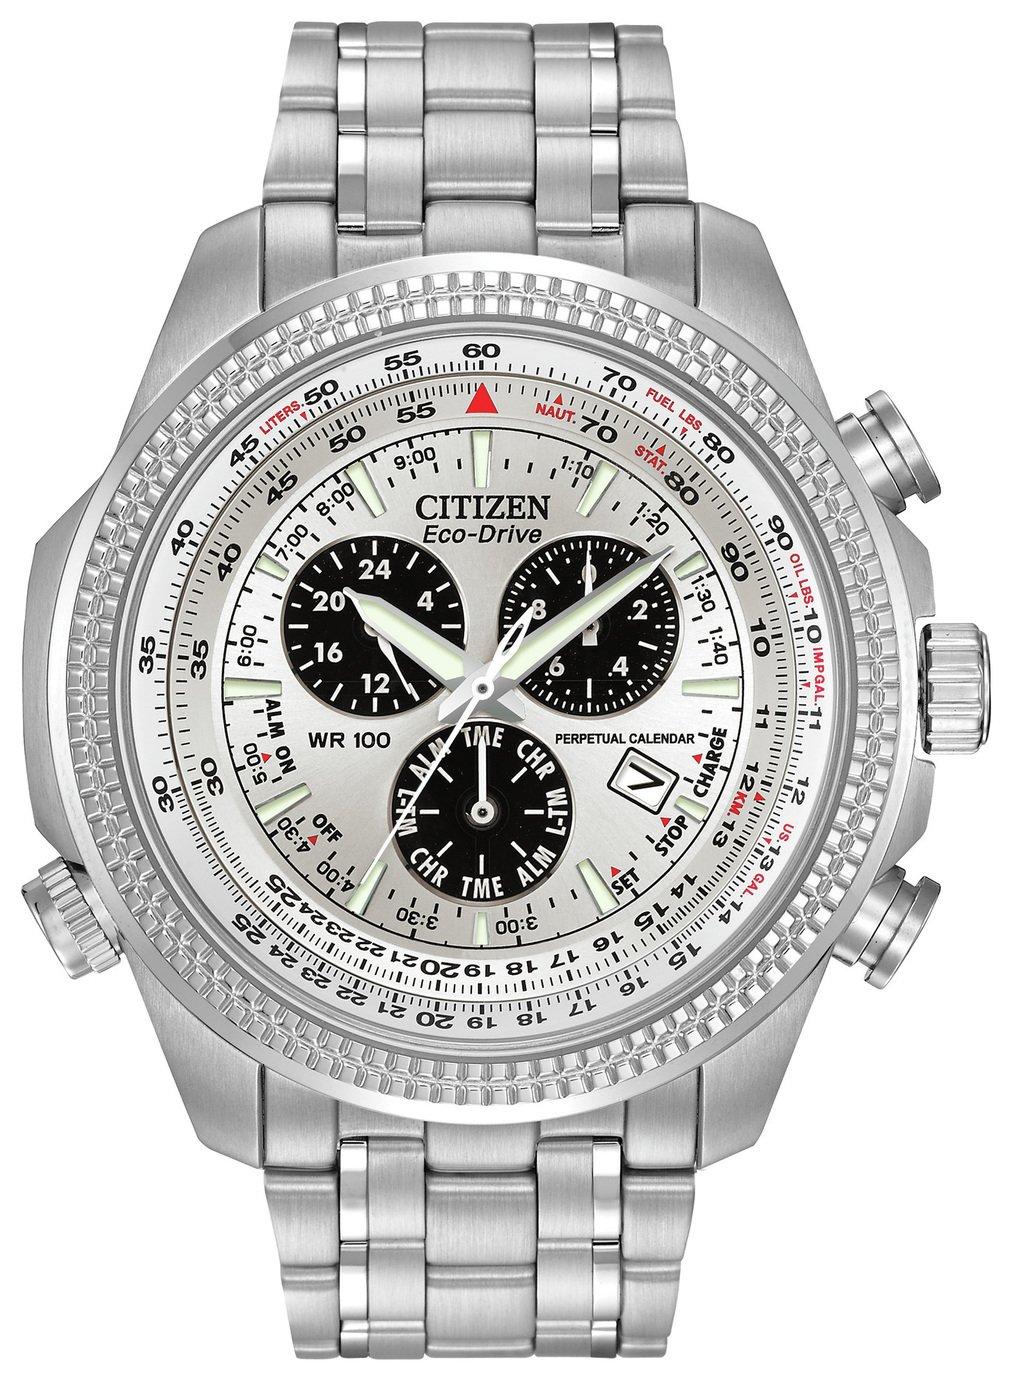 Image of Citizen Men's Eco-Drive Perpetual Calendar Chronograph Watch